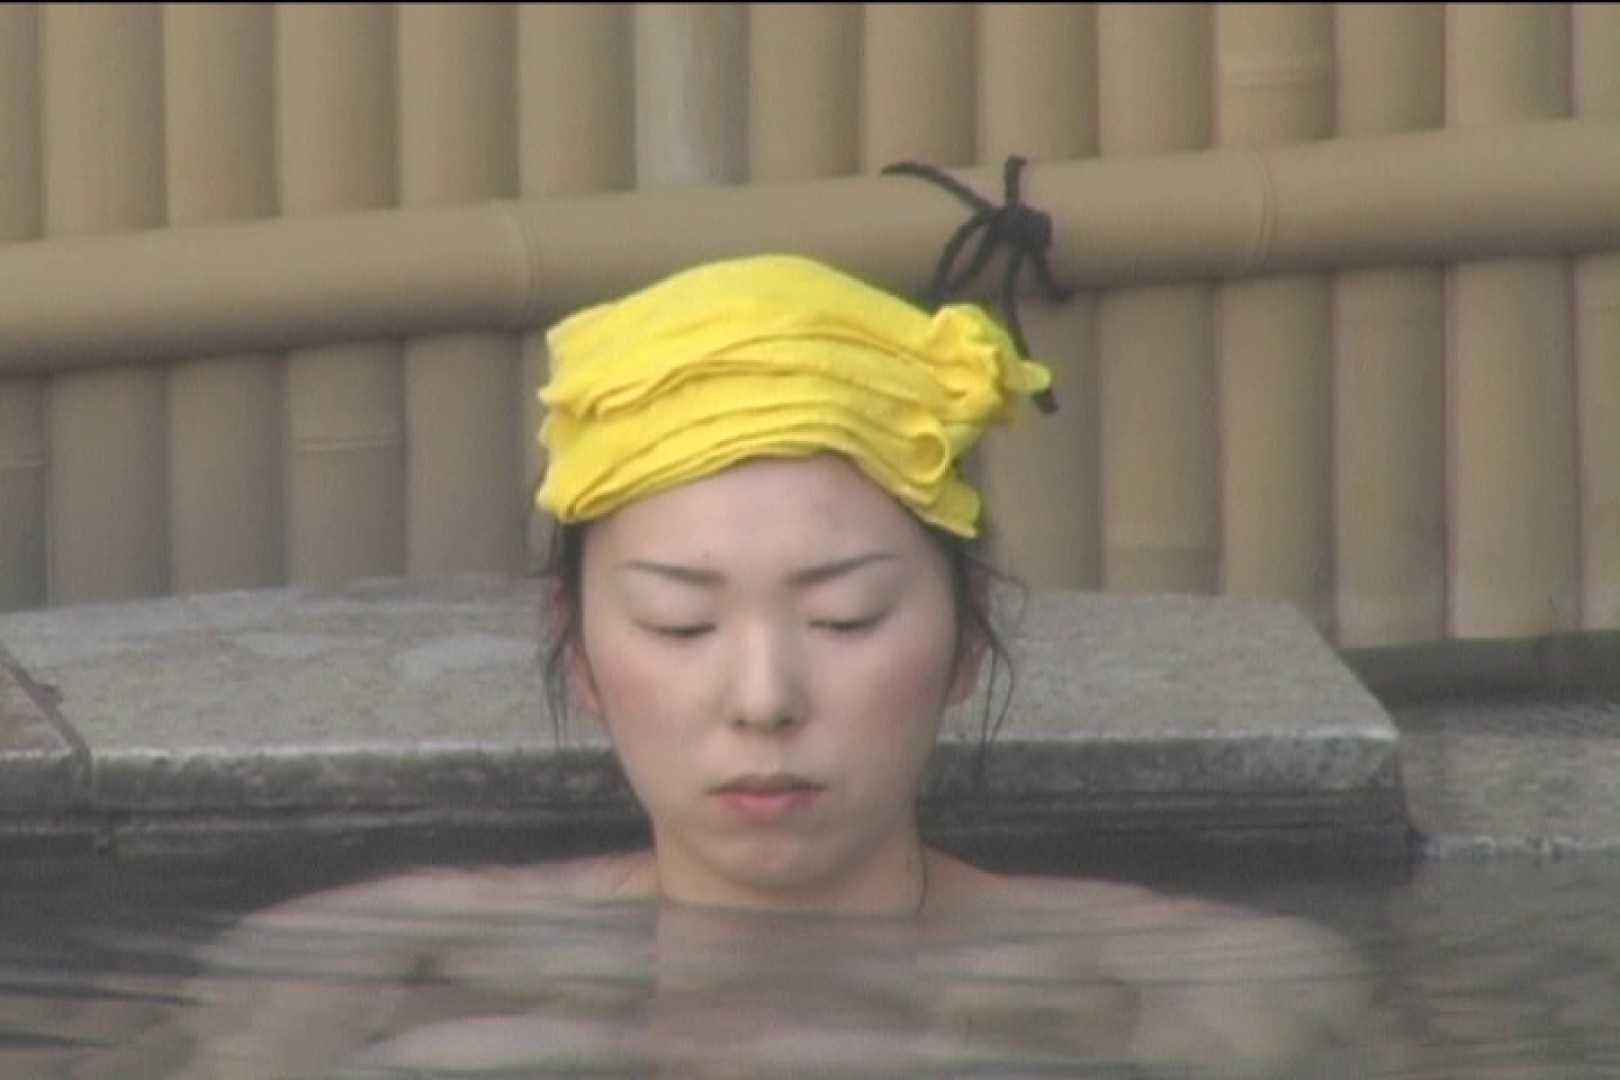 Aquaな露天風呂Vol.529 盗撮シリーズ | 露天風呂編  106PIX 57